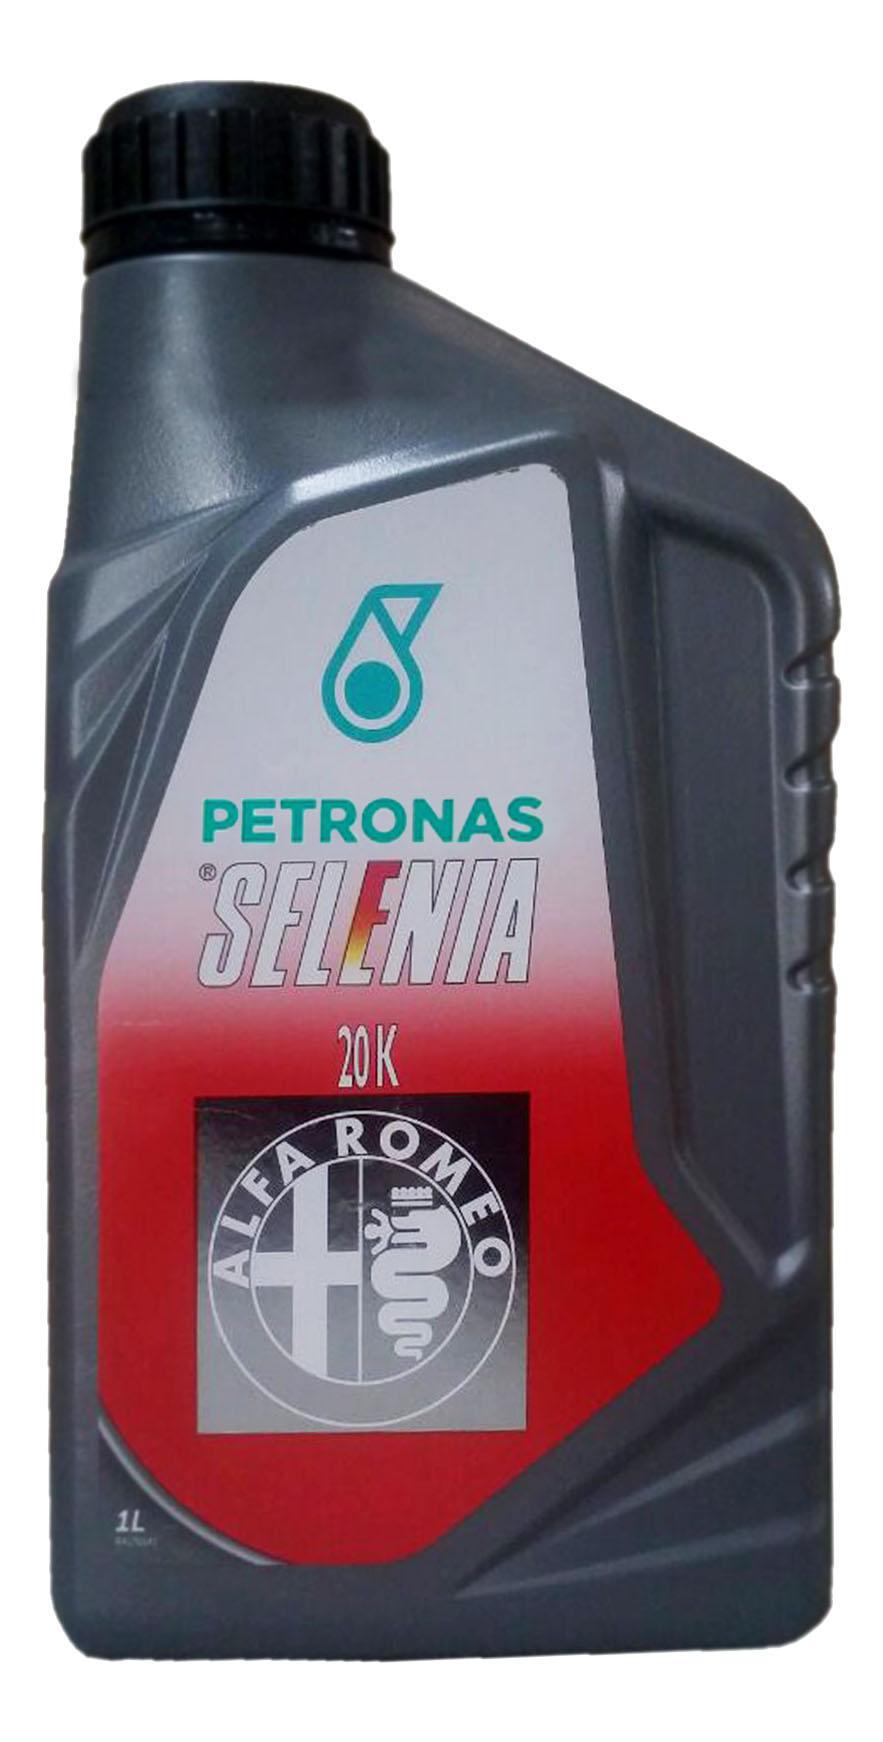 Моторное масло Selenia 20 K Alfa Romeo 10W-40 1л 16401619